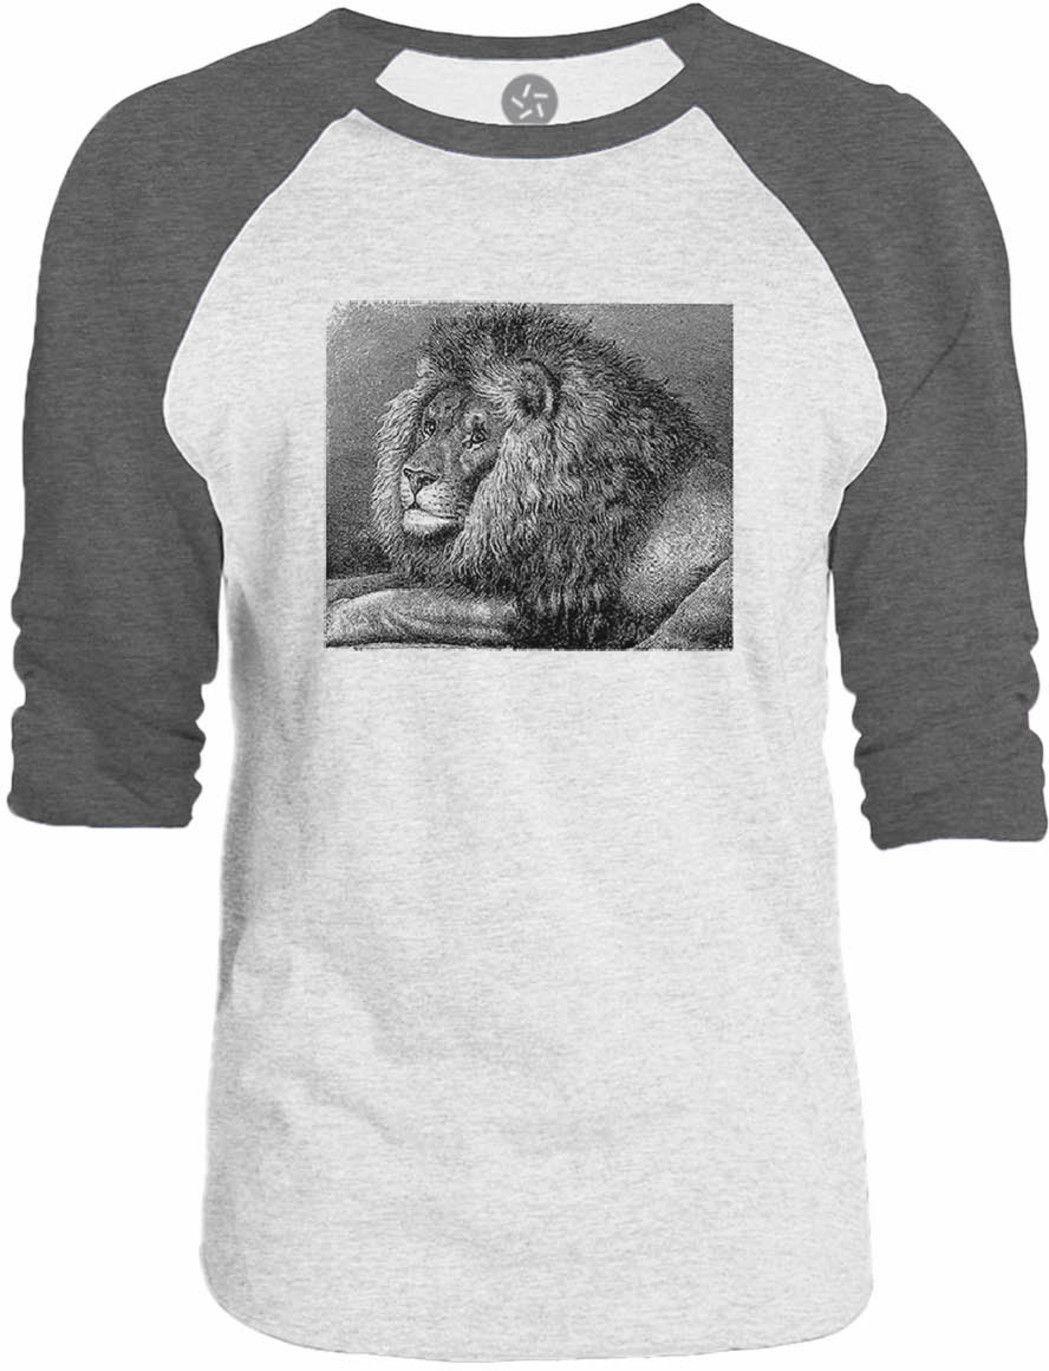 Big Texas Vintage Lion Illustration 3/4-Sleeve Raglan Baseball T-Shirt